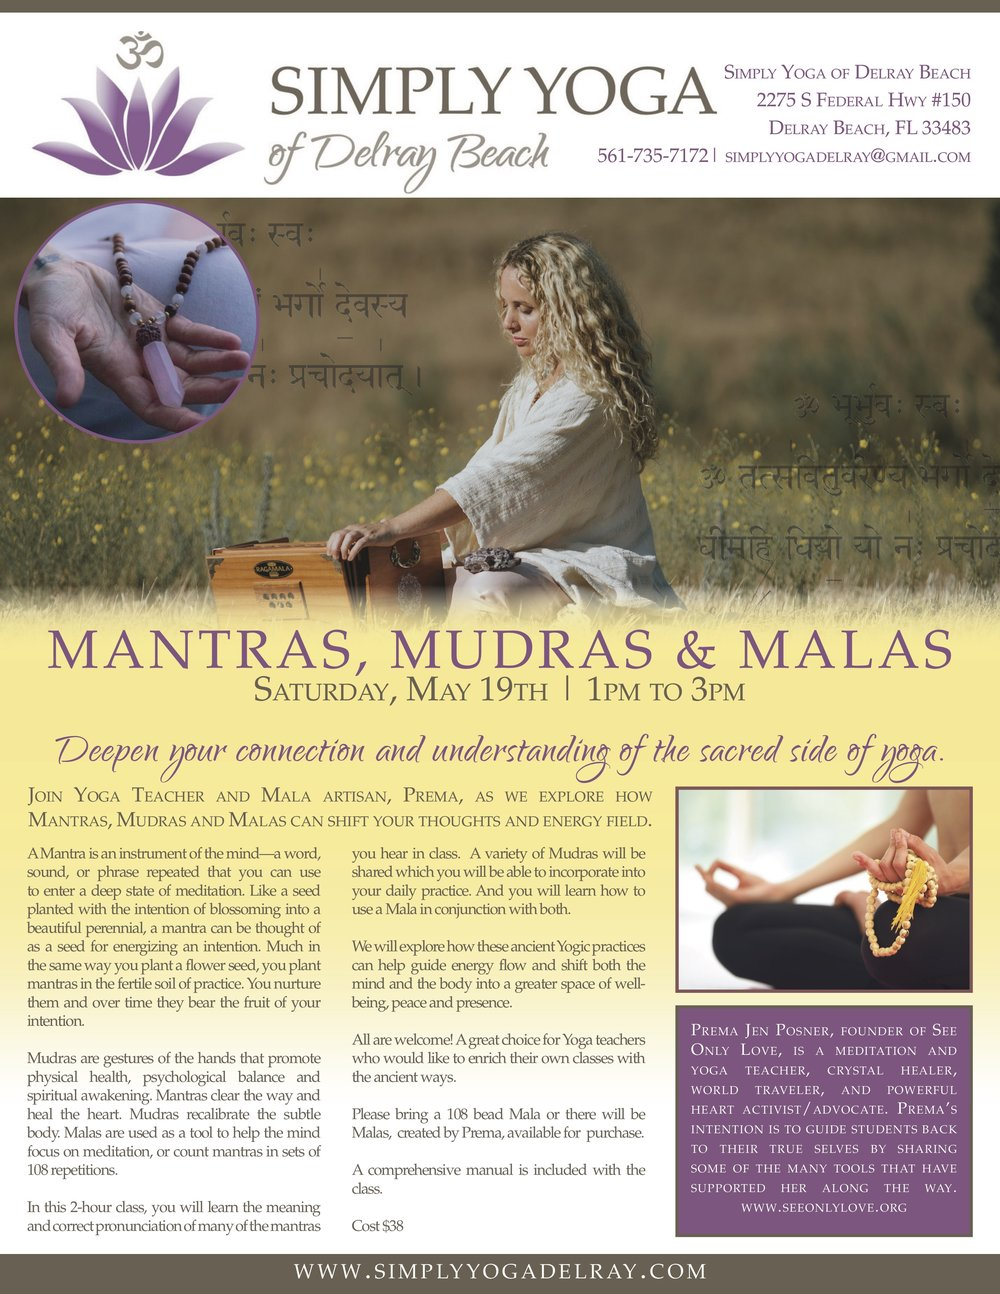 Mantras, Mudras, and Malas  Simply Yoga of Delray Beach.jpg